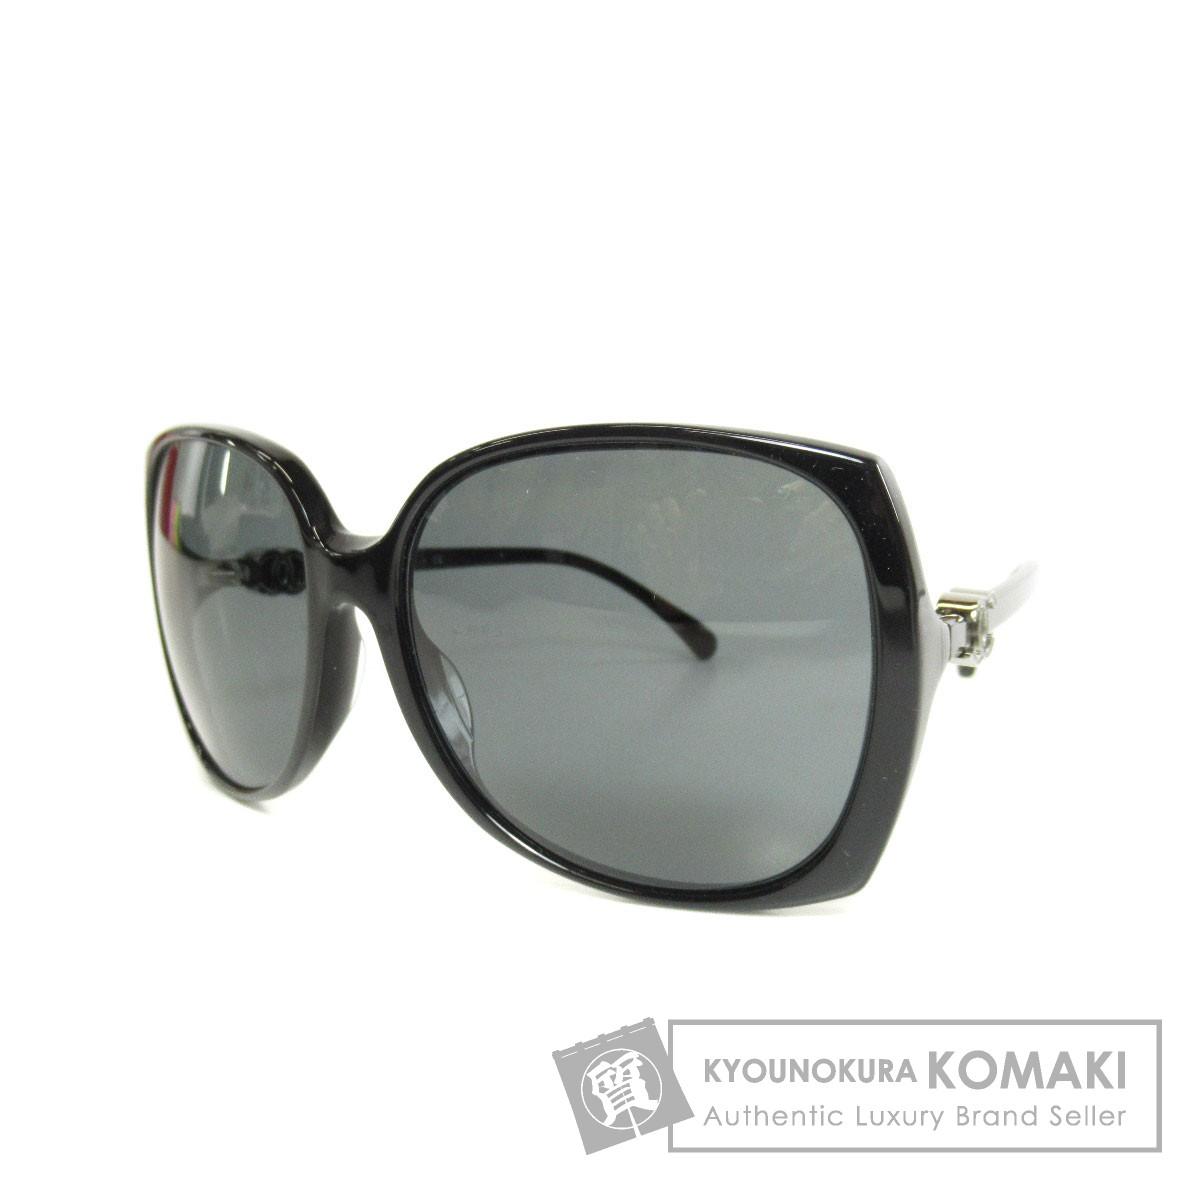 a08bfd25bb Kyonokura Komaki Brand Cheapest Challenger: Authentic CHANEL COCO ...